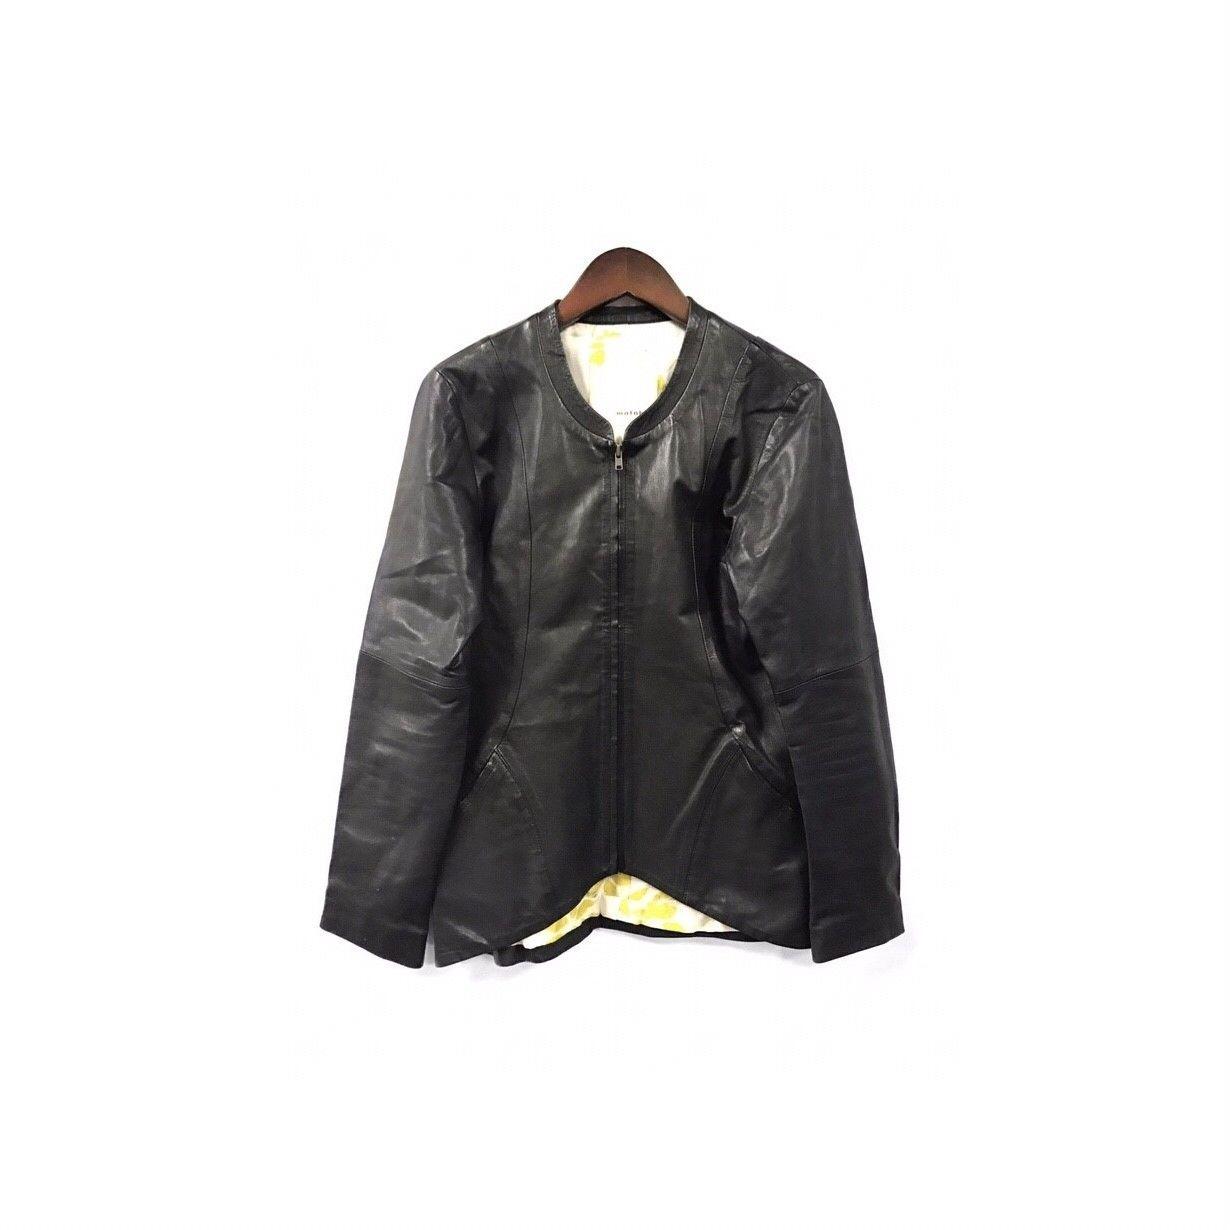 matohu - Leather Nocollar Jacket (size - M) ?22000+tax→?17600+tax